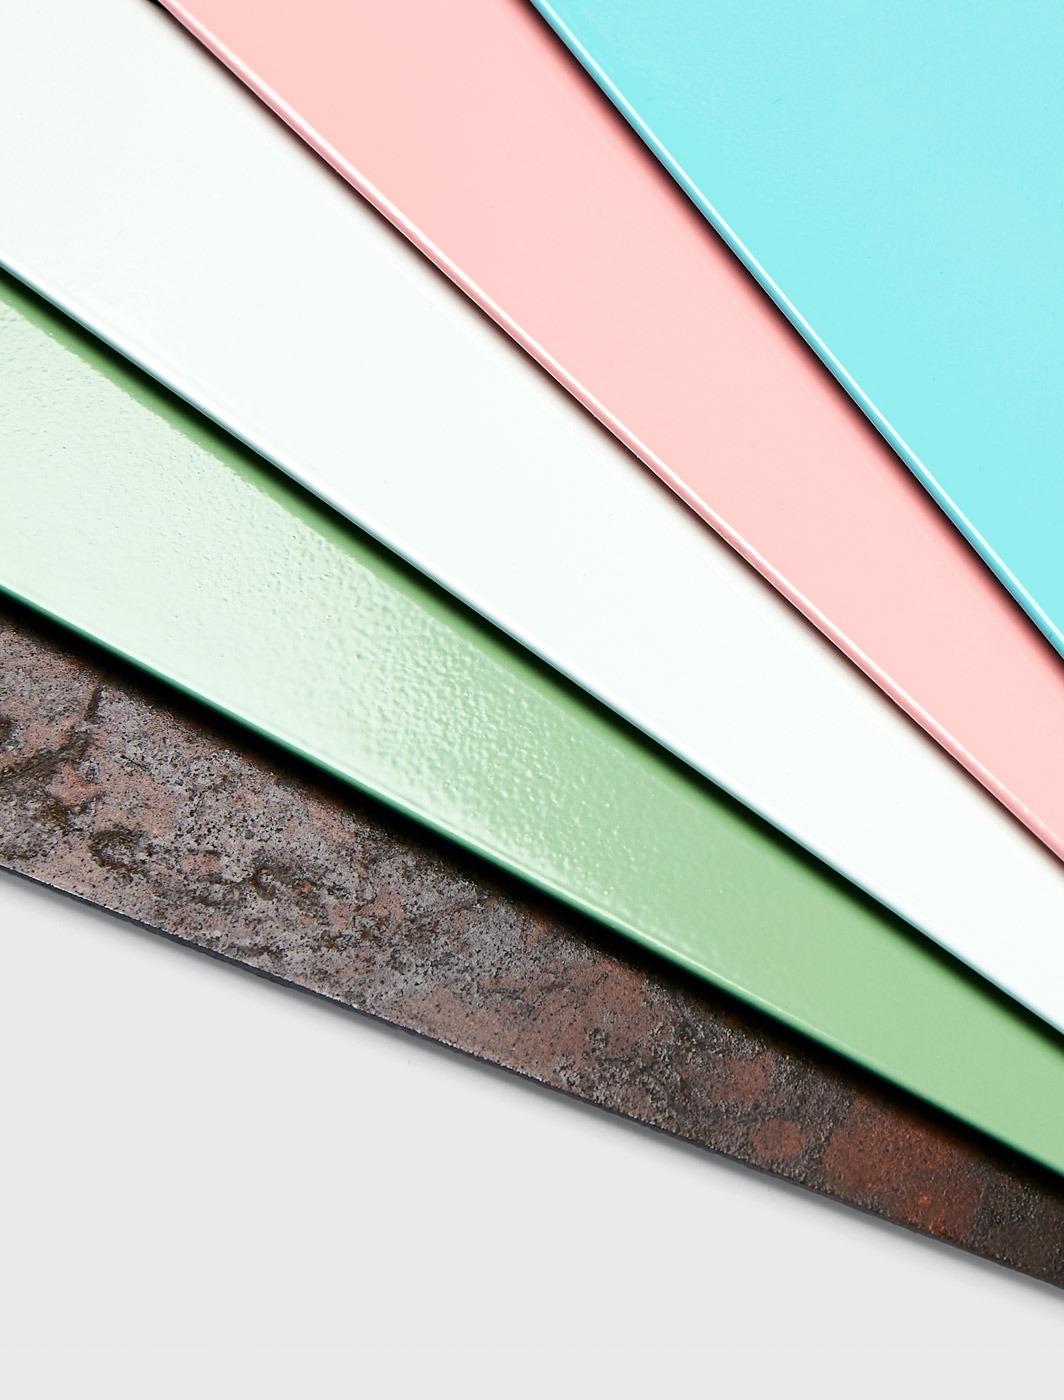 Frontplatten für den Käues-Automaten